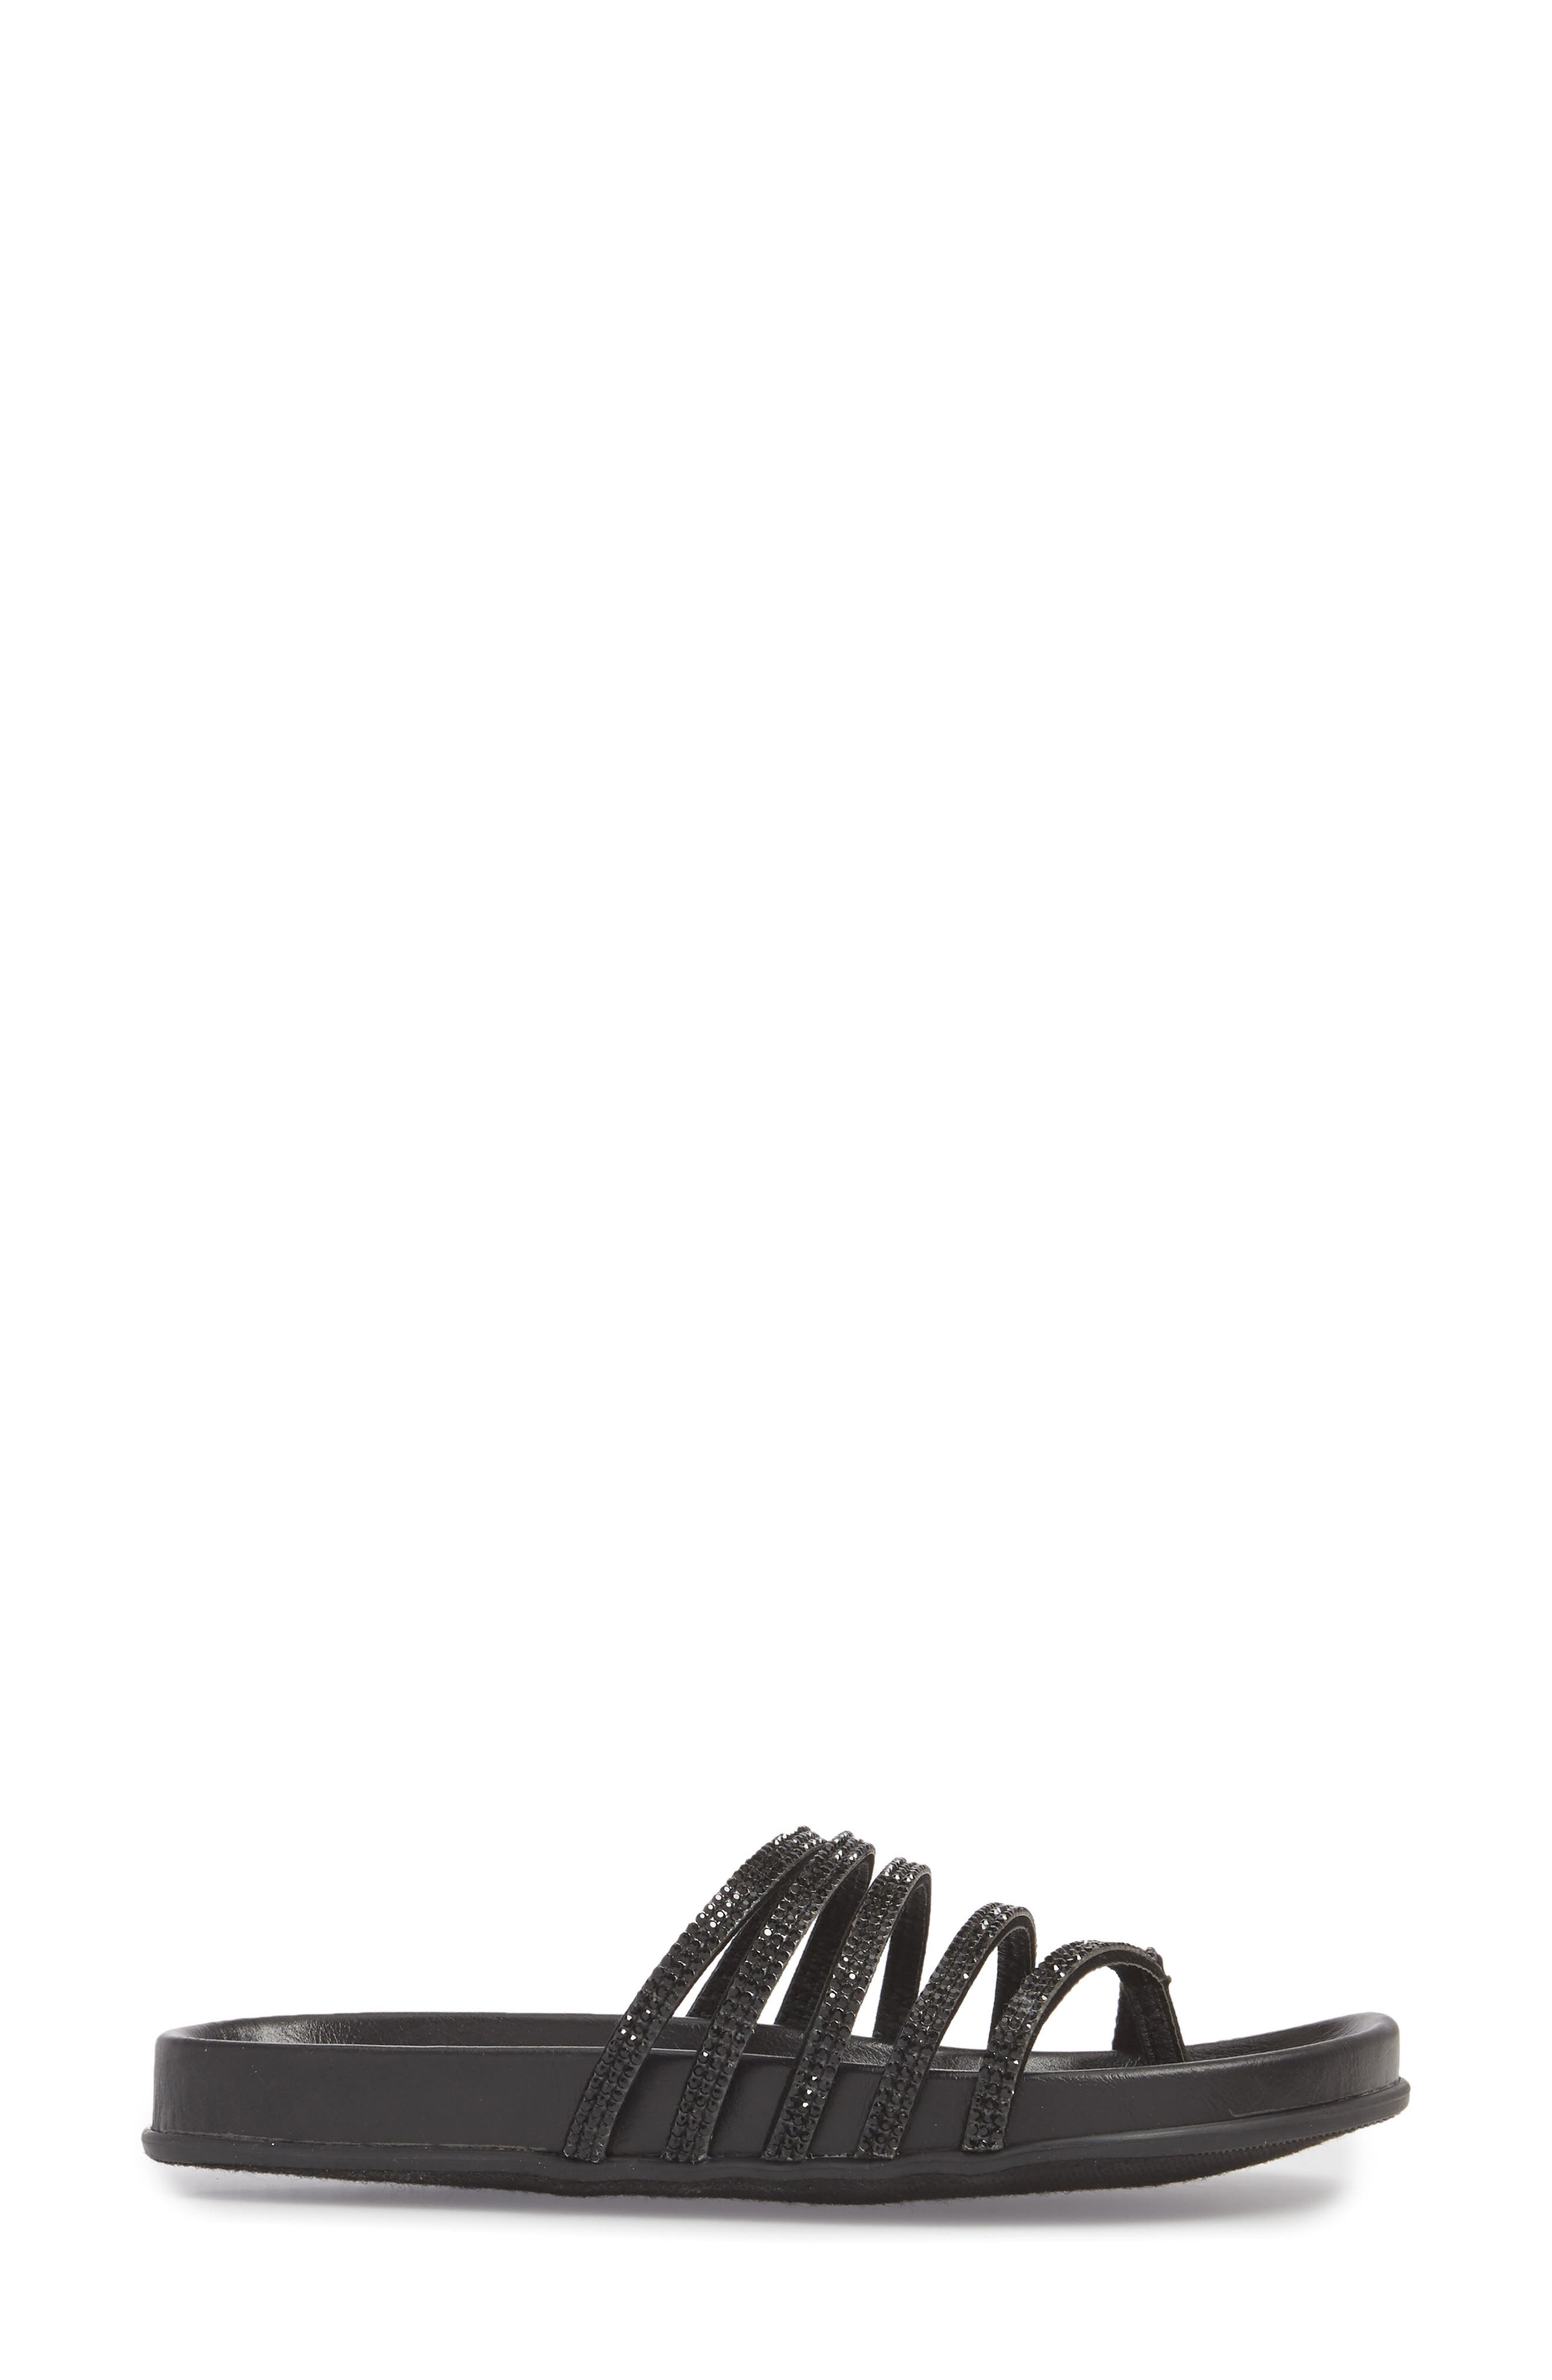 Kendari Sandal,                             Alternate thumbnail 3, color,                             BLACK